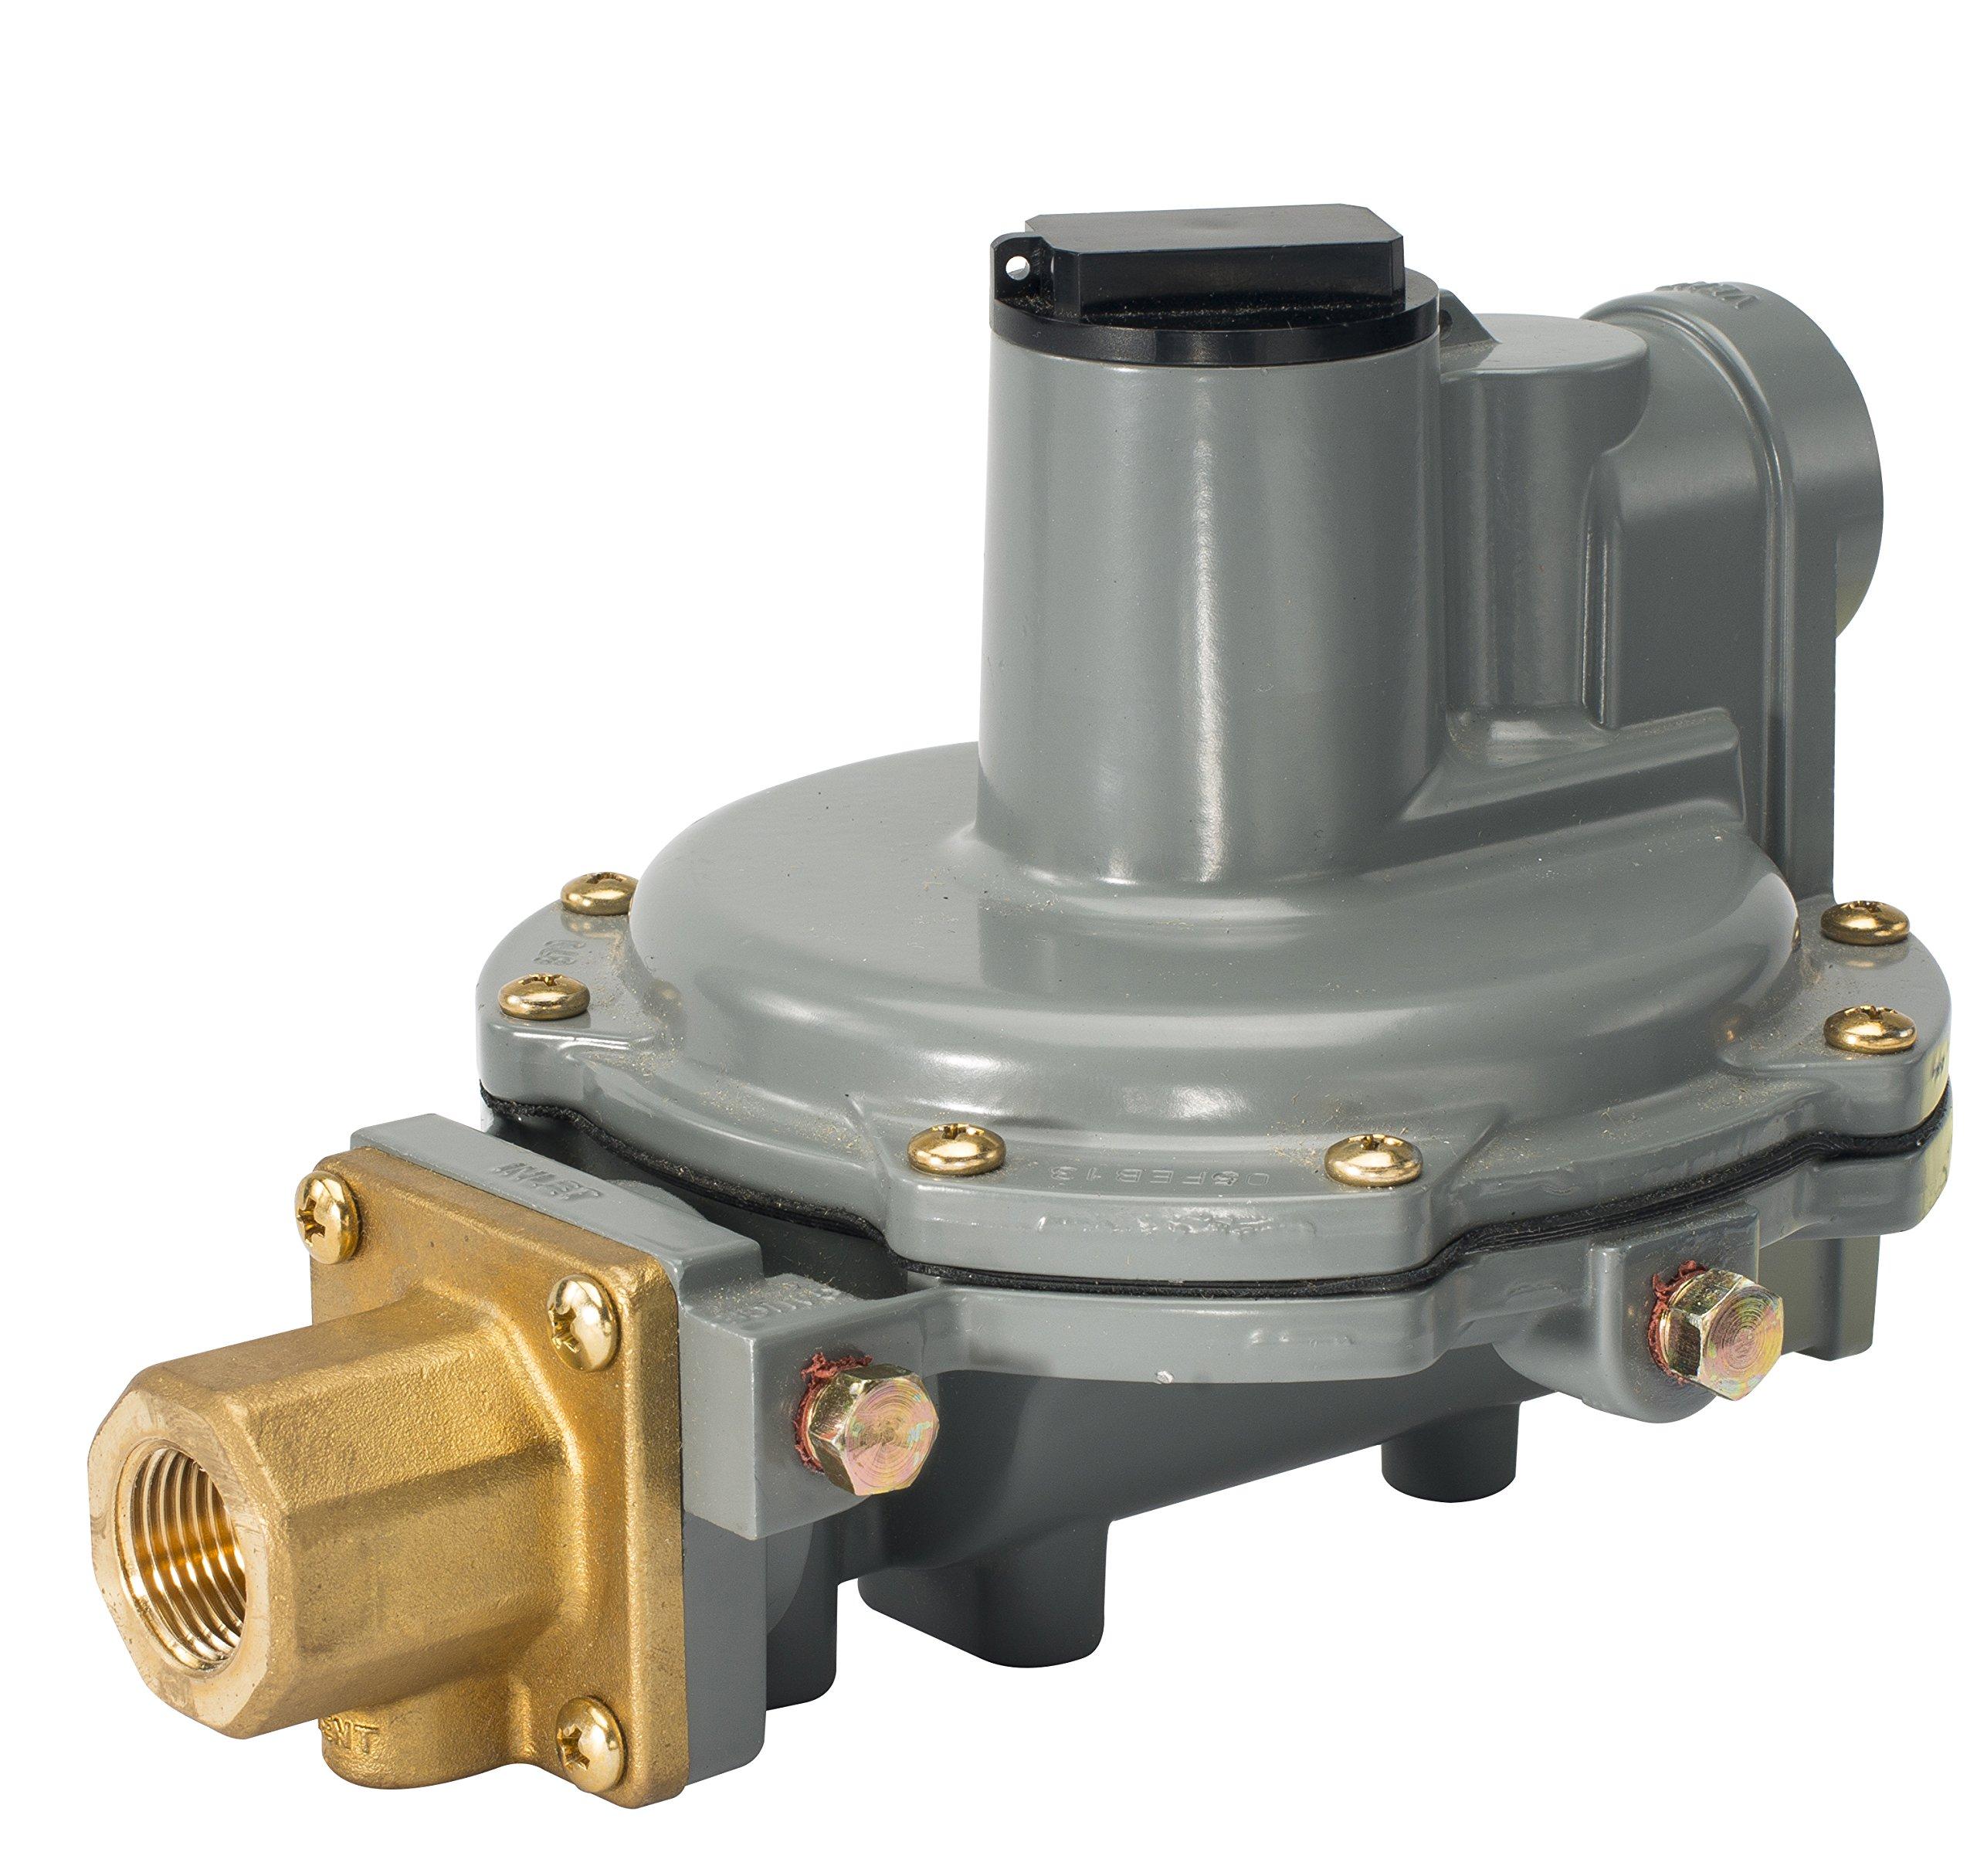 Emerson-Fisher LP-Gas Equipment R632A-JFF Integral 2-Stage Regulator, 9-13'' W.C Spring, POL'' x 3/4'' NPT